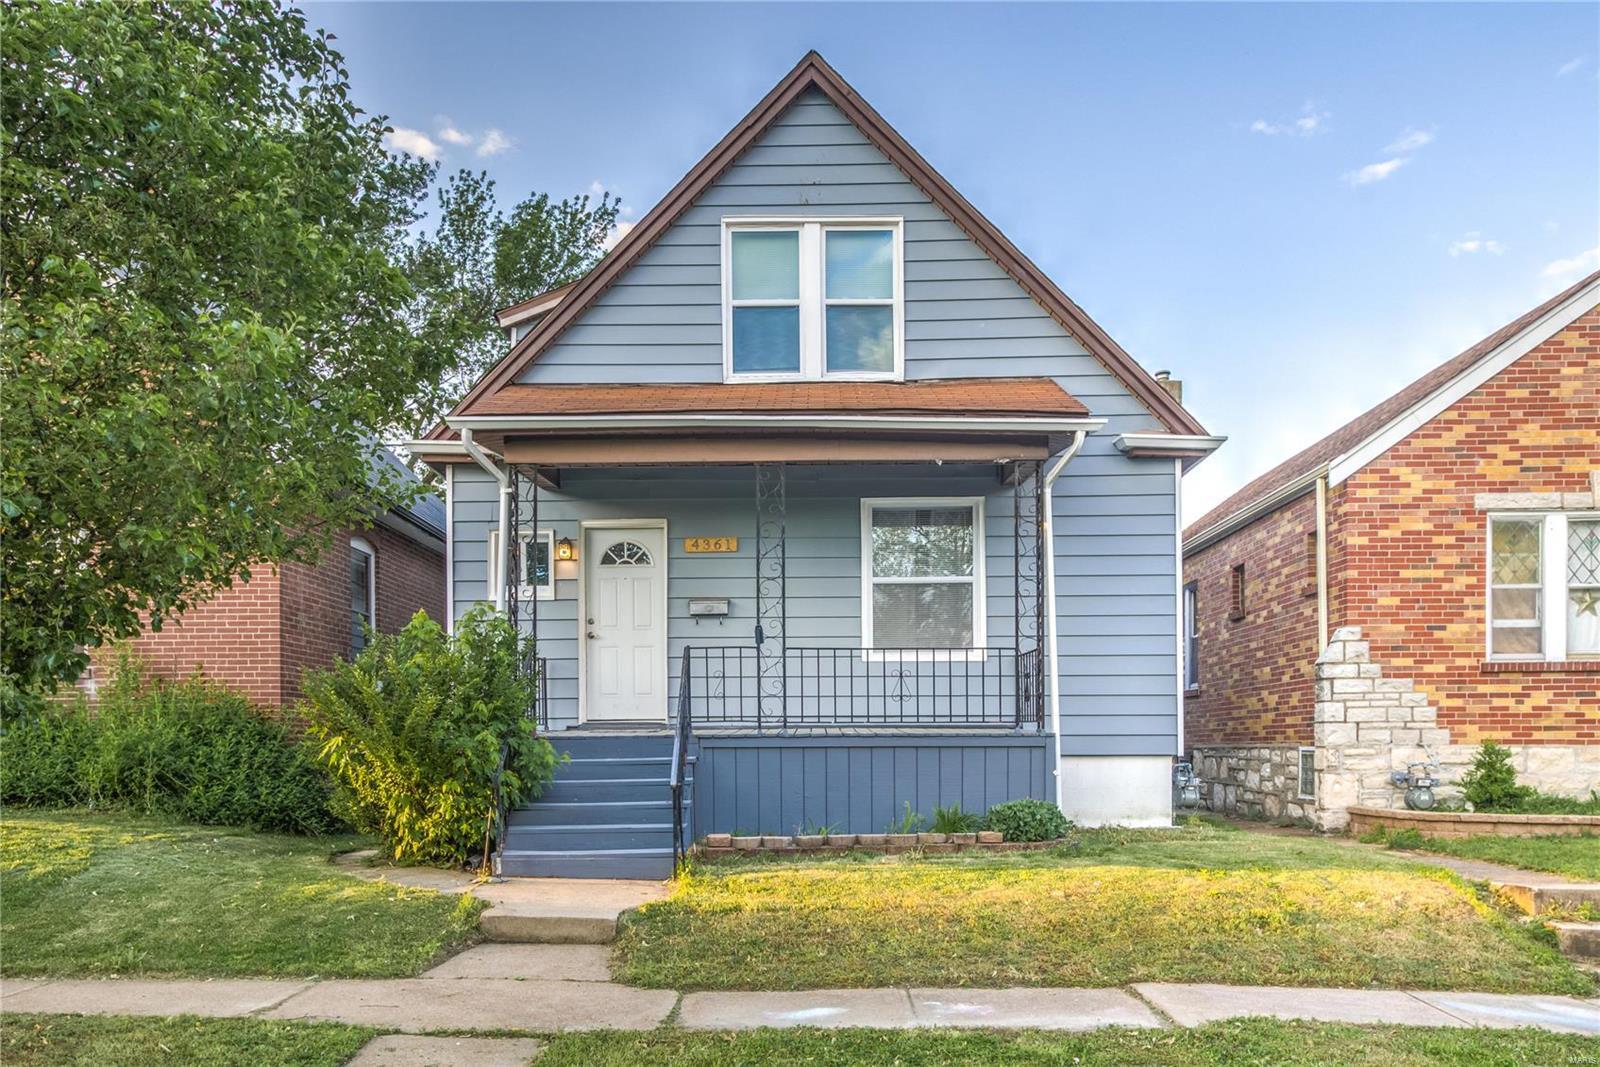 4361 Itaska Property Photo - St Louis, MO real estate listing